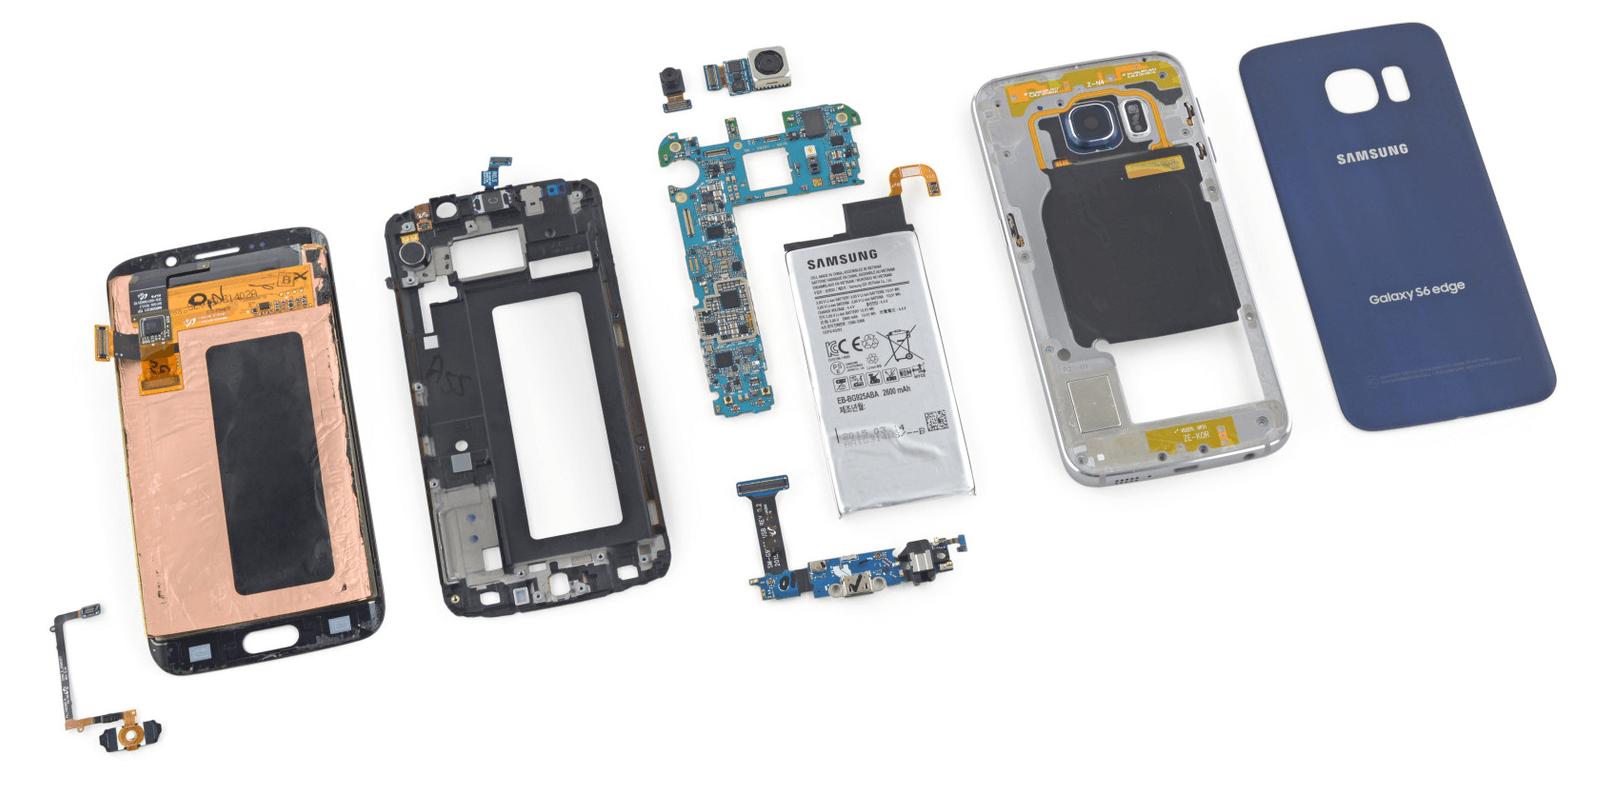 Service Samsung Galaxy Tanpa Nota Pembelian (Pengalaman)